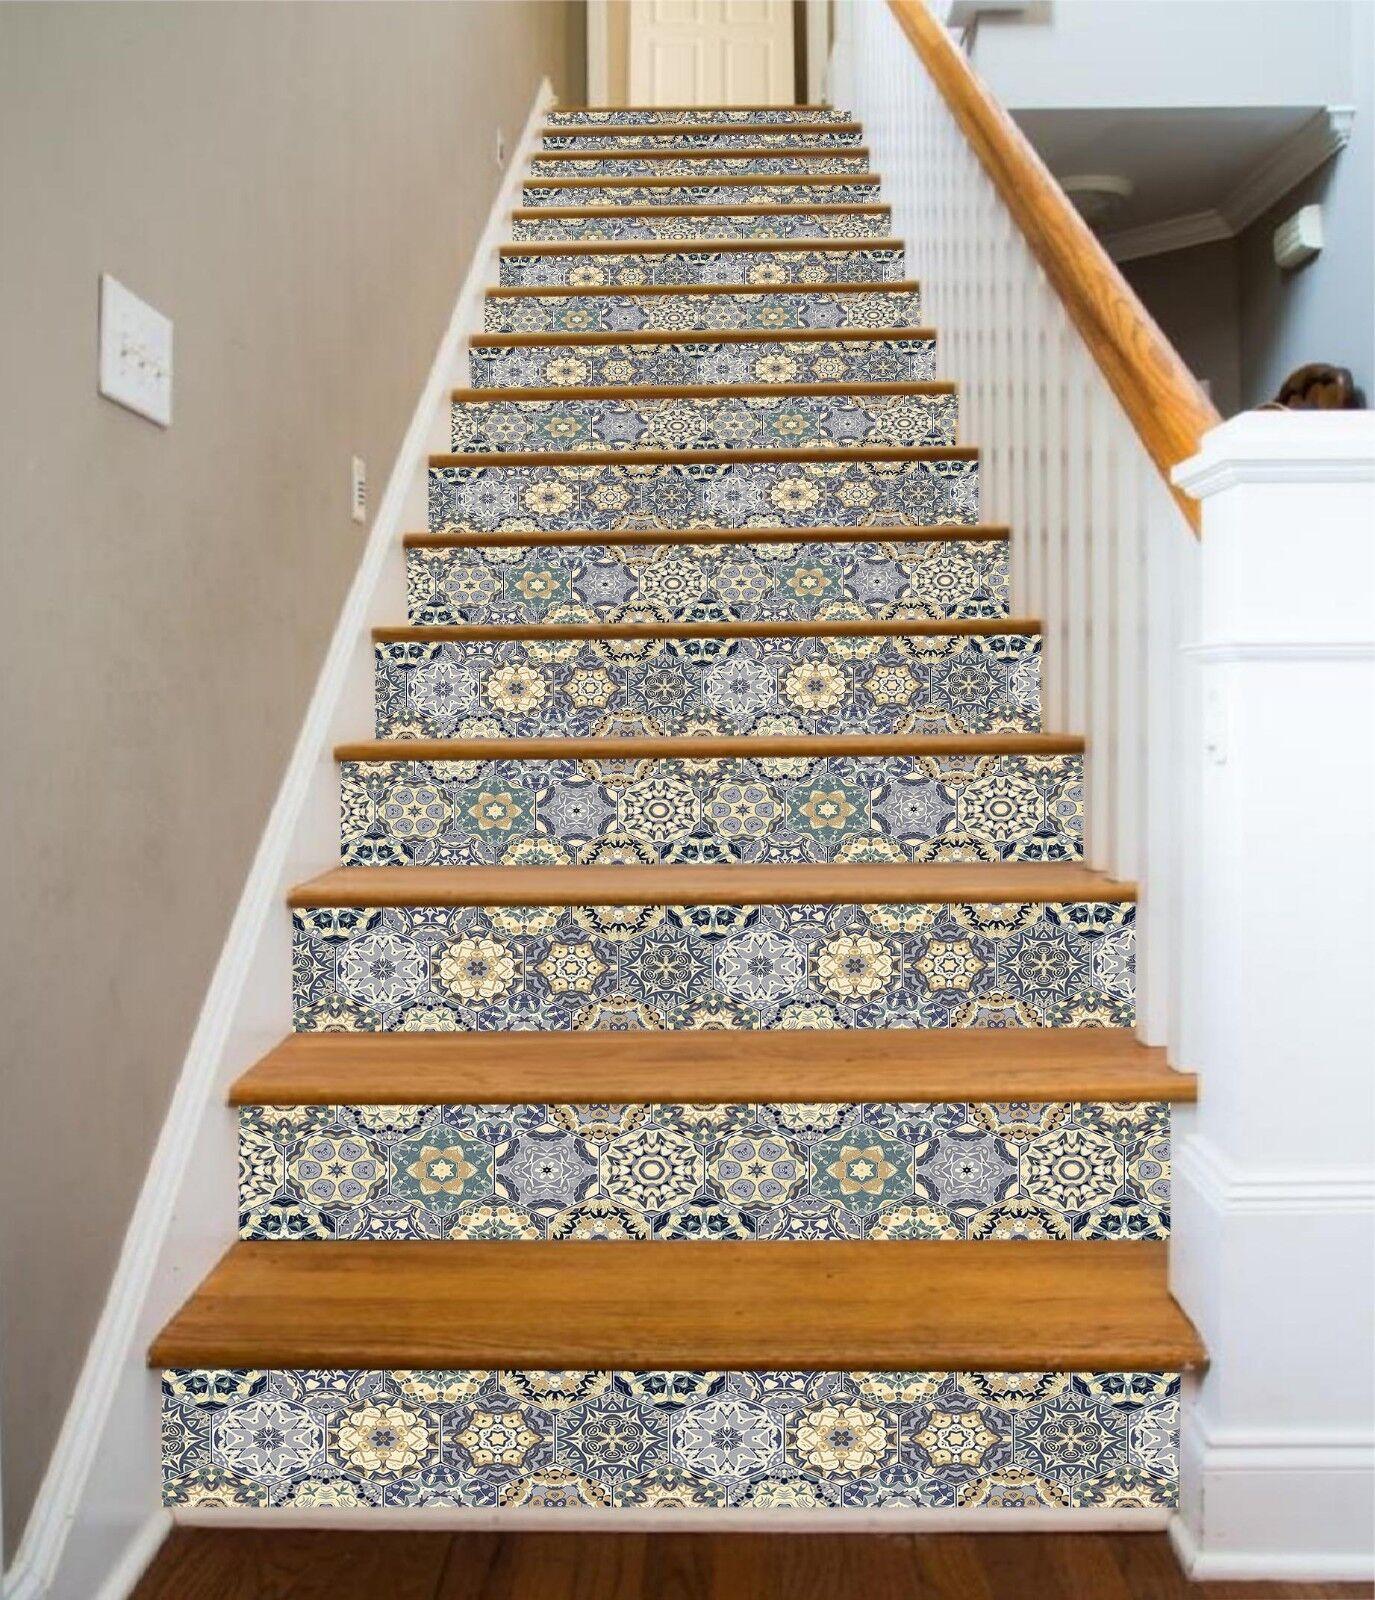 3D Complex Flower 8 Tile Marble Stair Risers Photo Mural Vinyl Decal Wallpaper